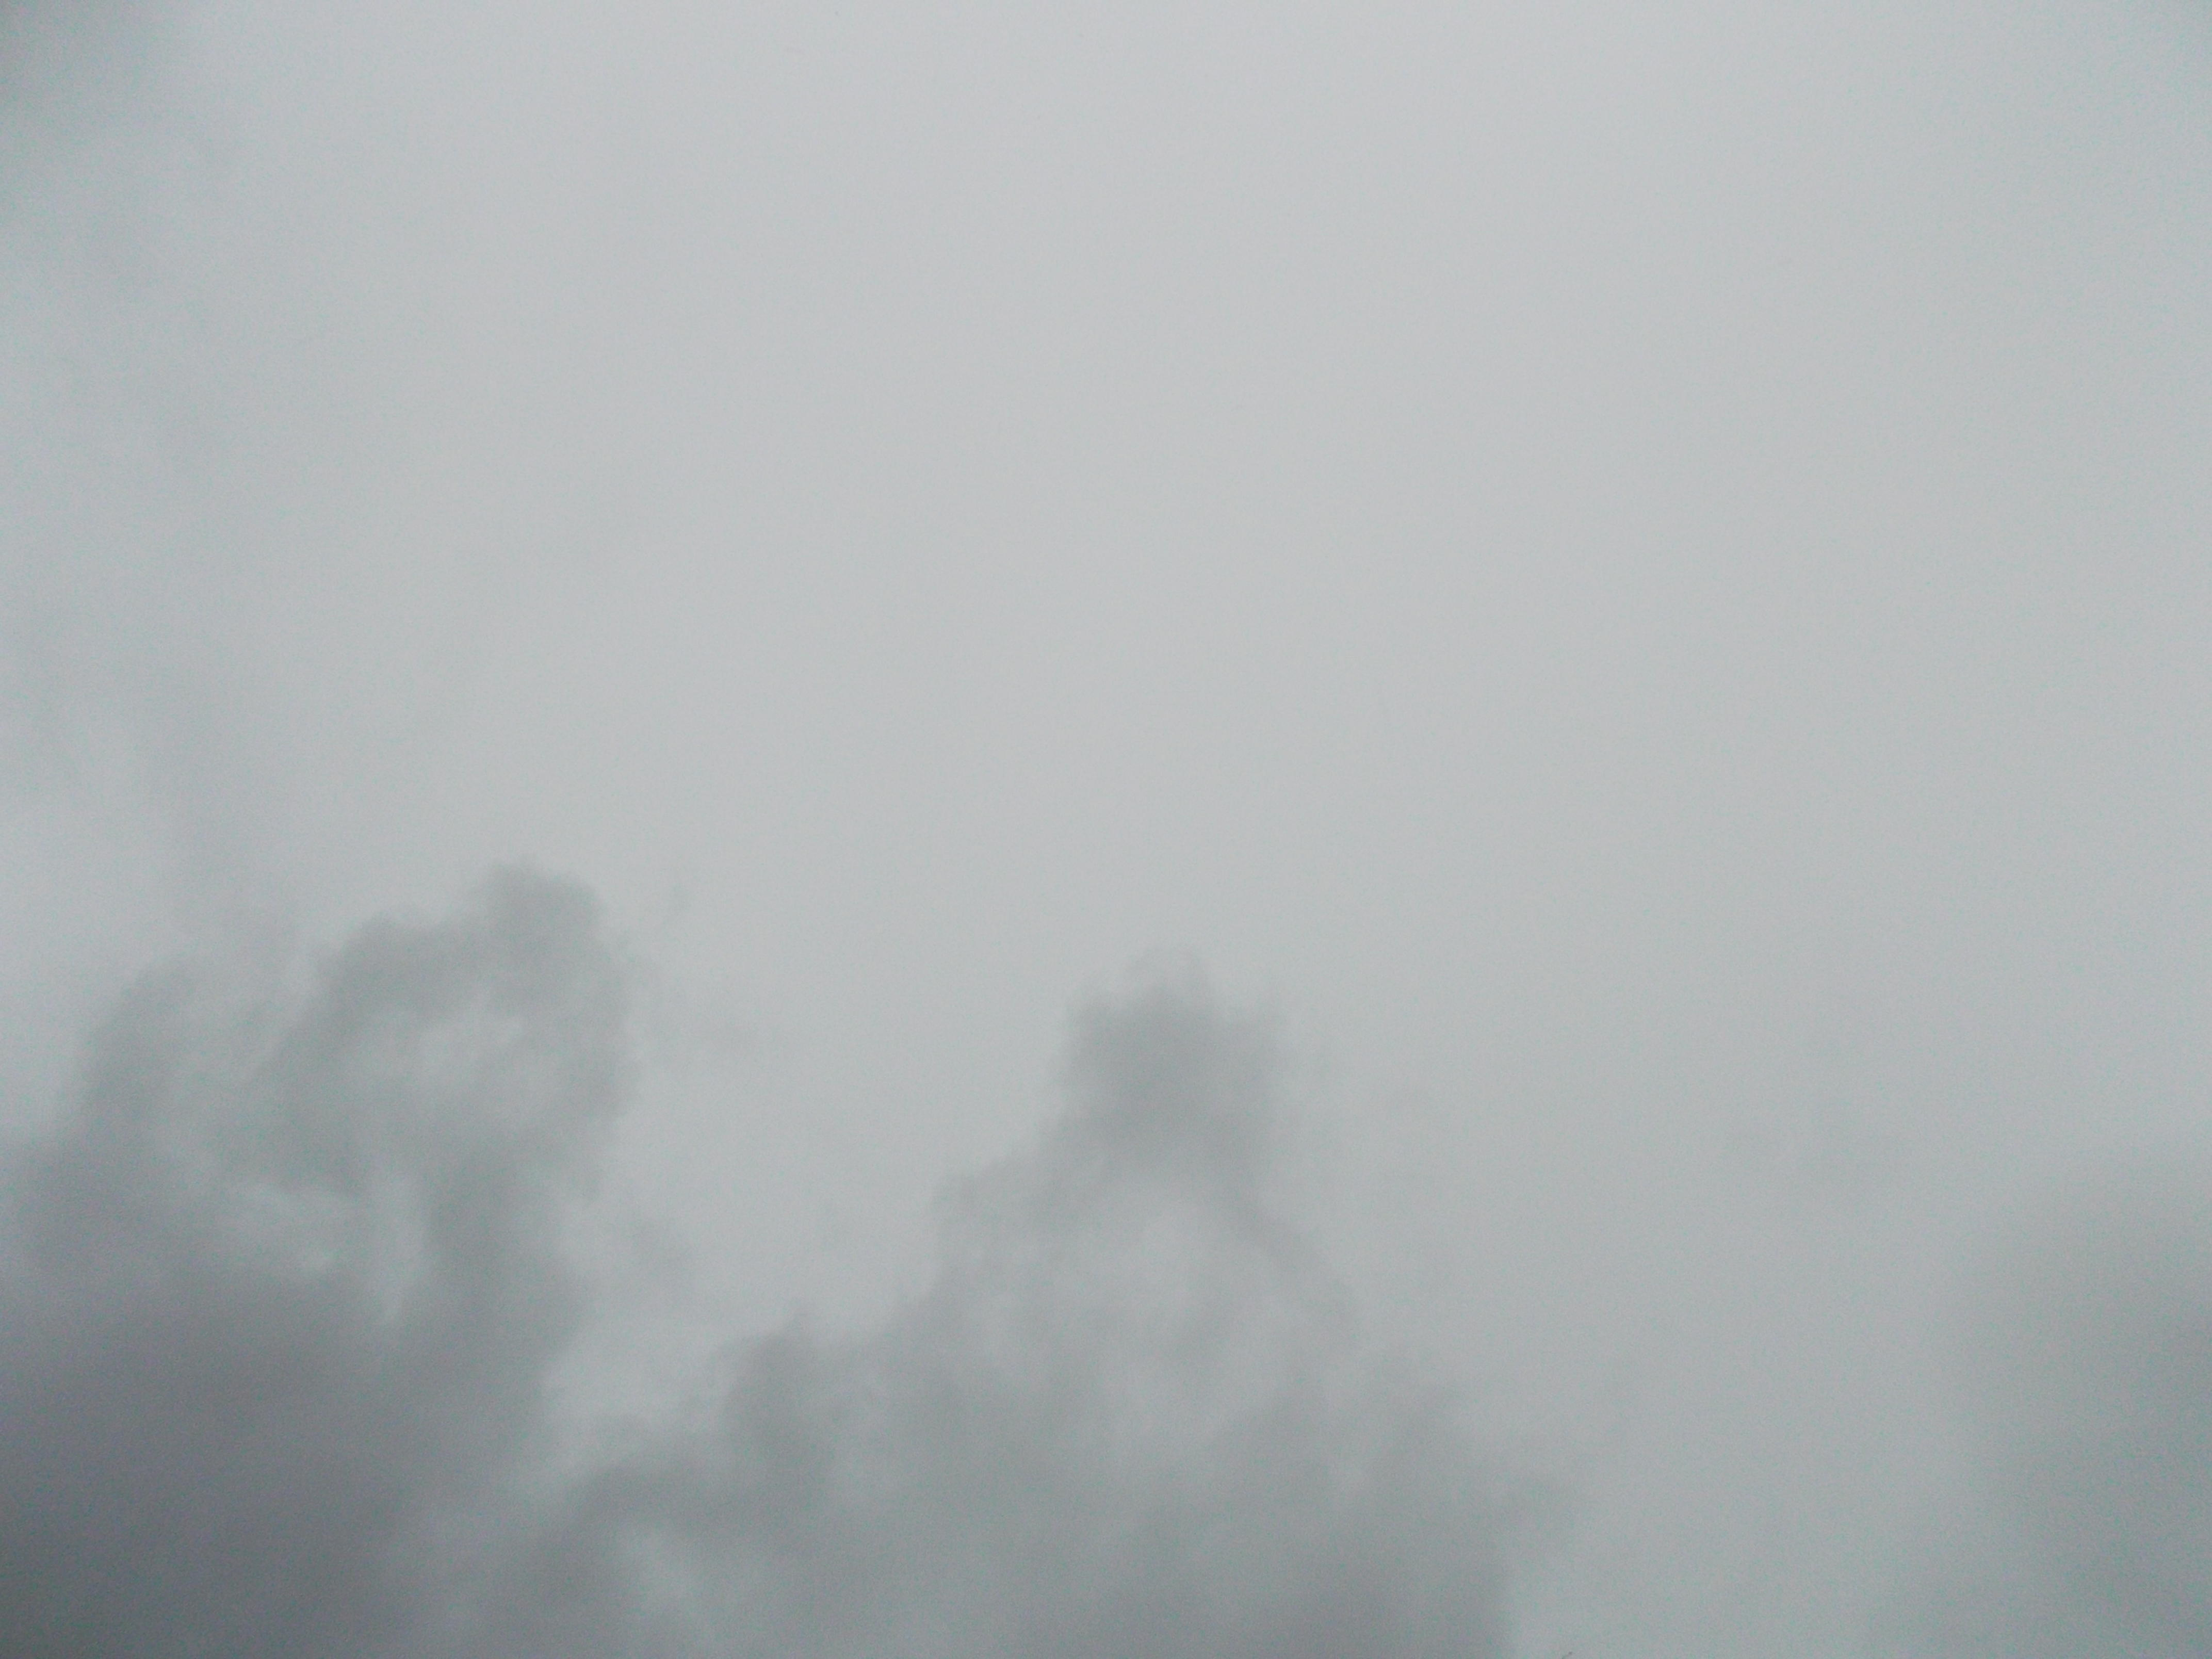 2013-04-10 Longitude -0.371 Latitude 49.182 Altitude 29 Heure 14h48